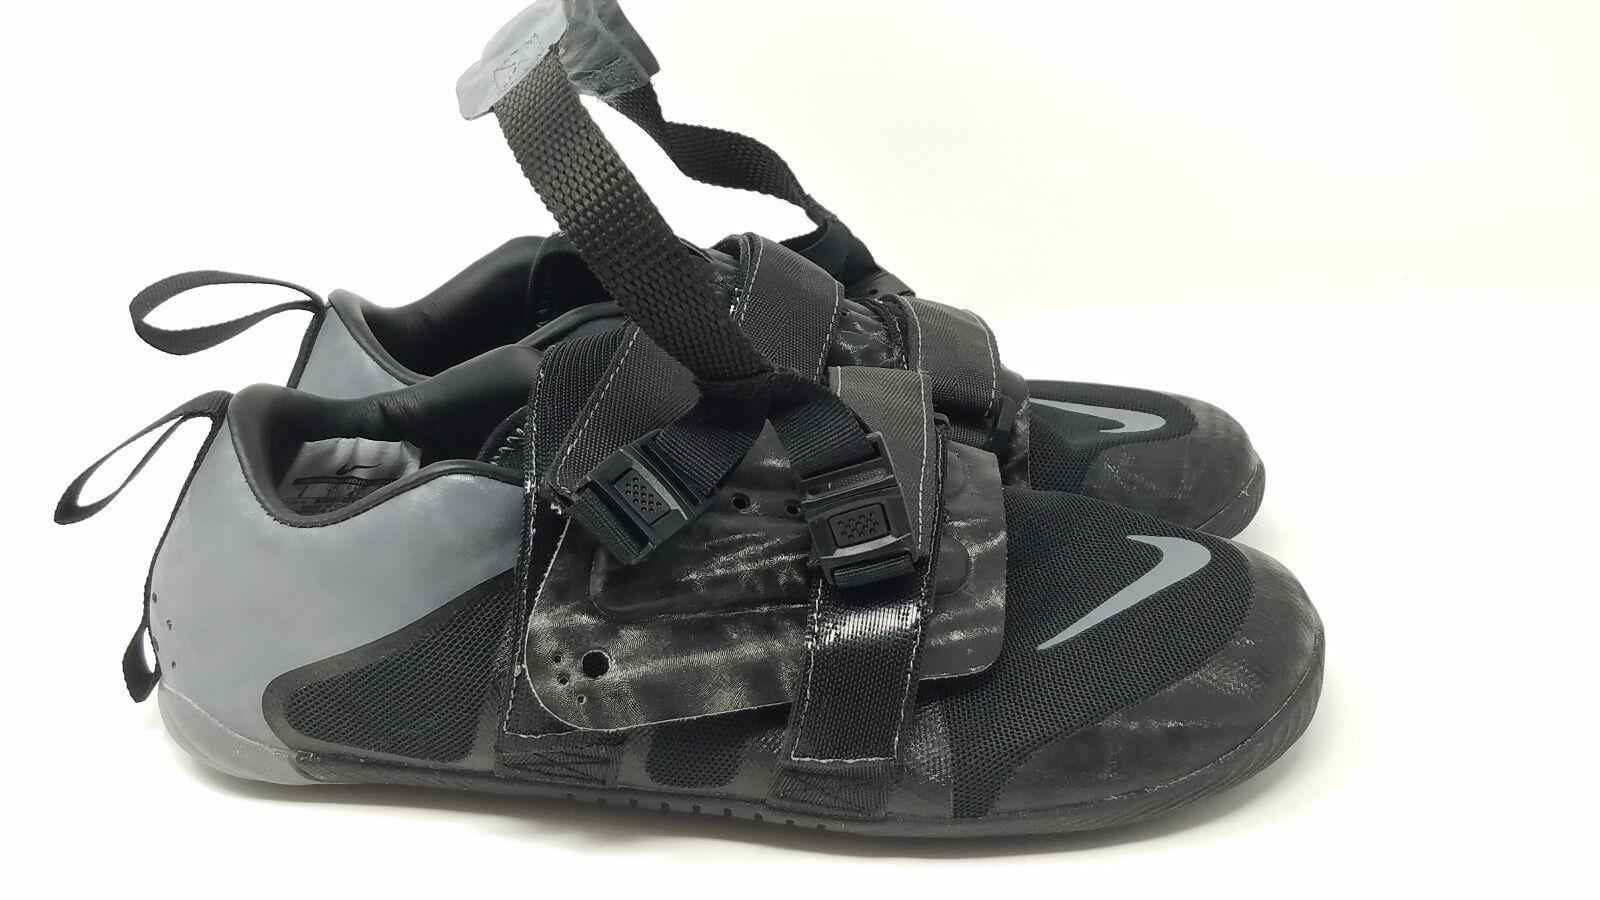 Nike OMADA 3 Rowing Rowing Rowing shoes Black Grey 803081-001 Sz 6 7754d2